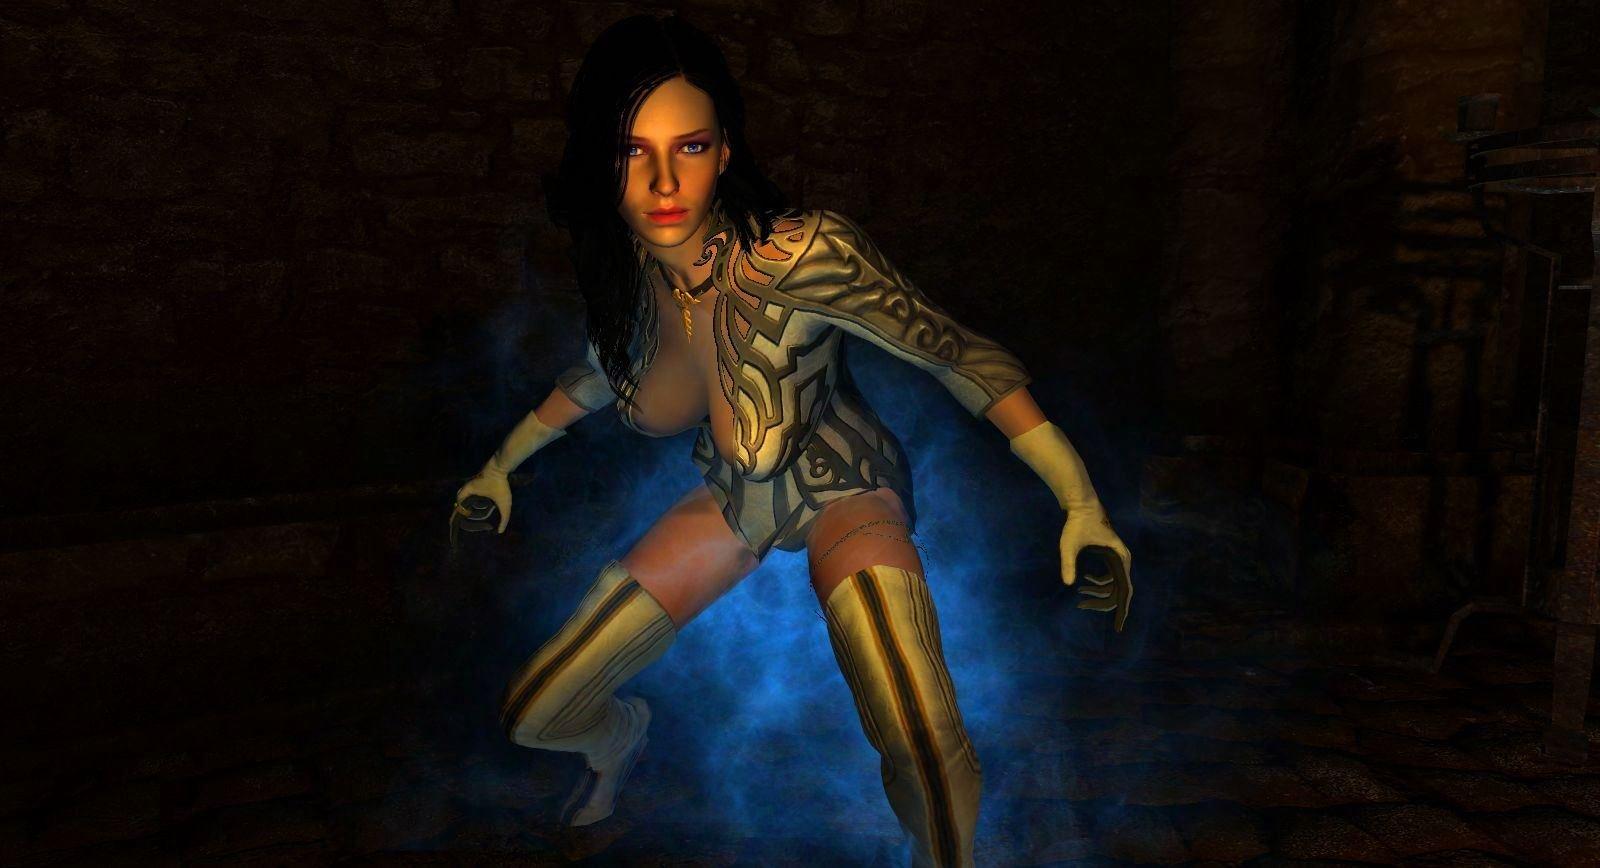 Йеннифер... SkyrimLE (тропики 4.0)